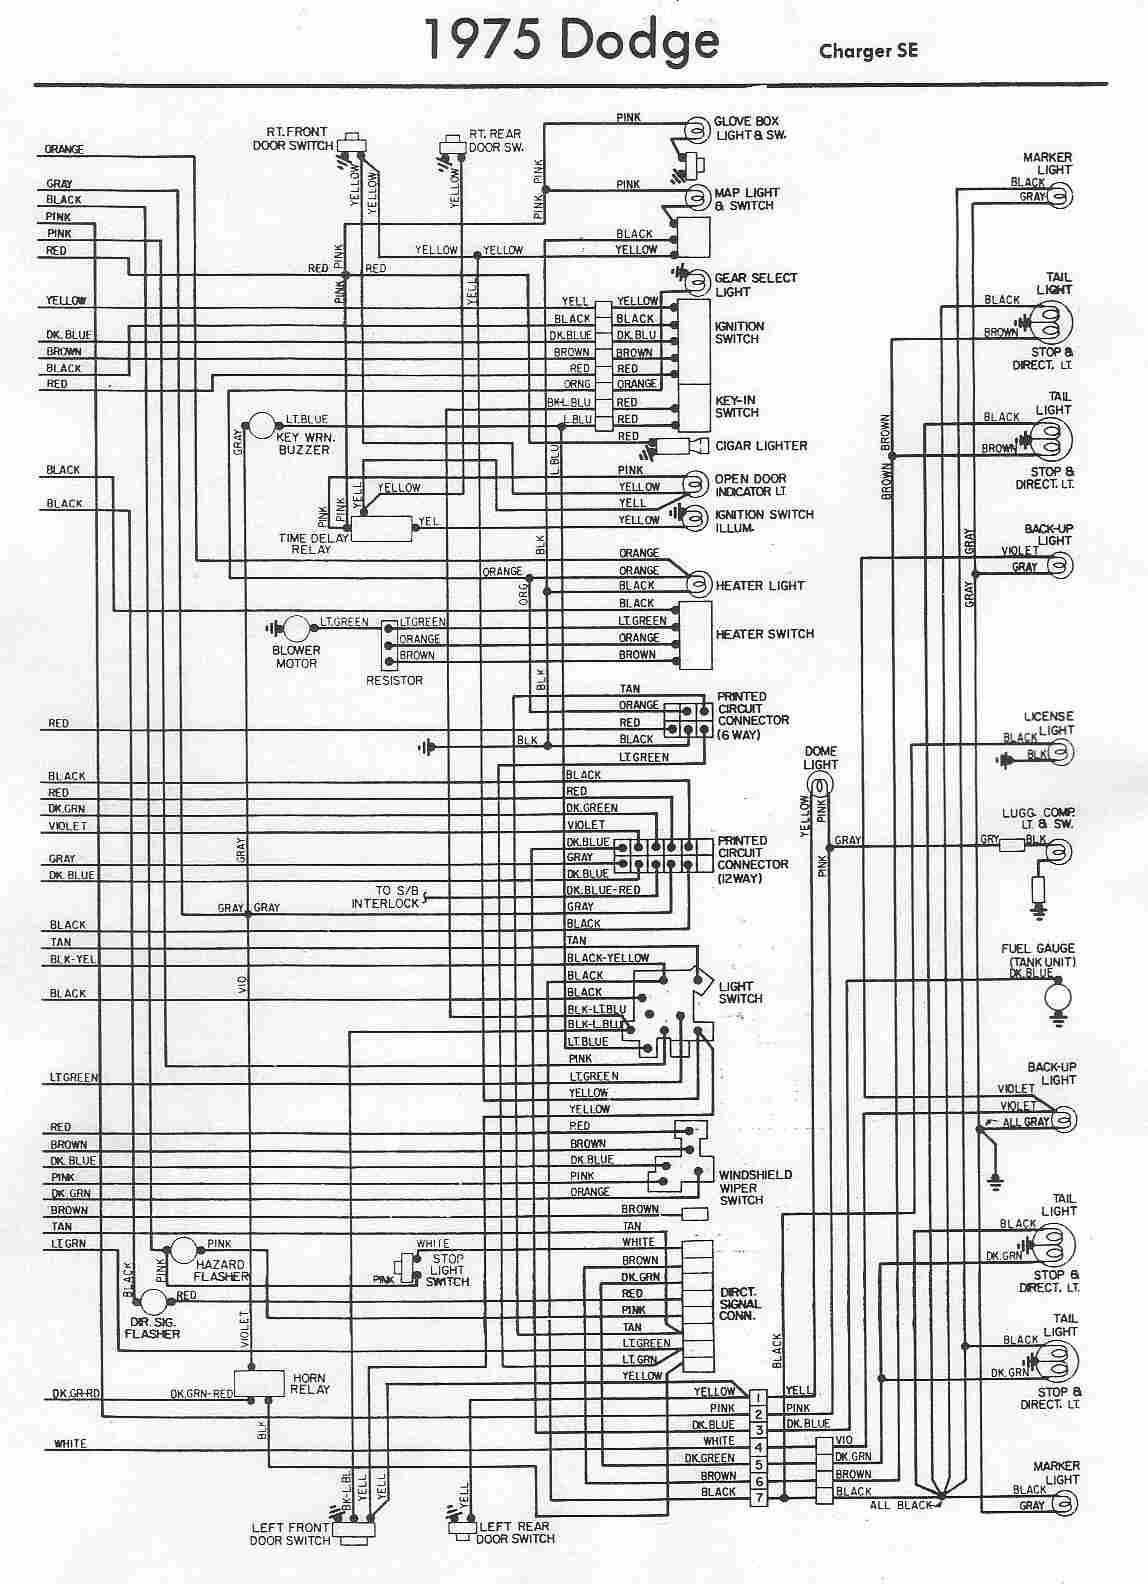 electrical diagram 1978 dodge power wagon wiring diagrams lol 1978 dodge pickup wiring [ 1148 x 1584 Pixel ]